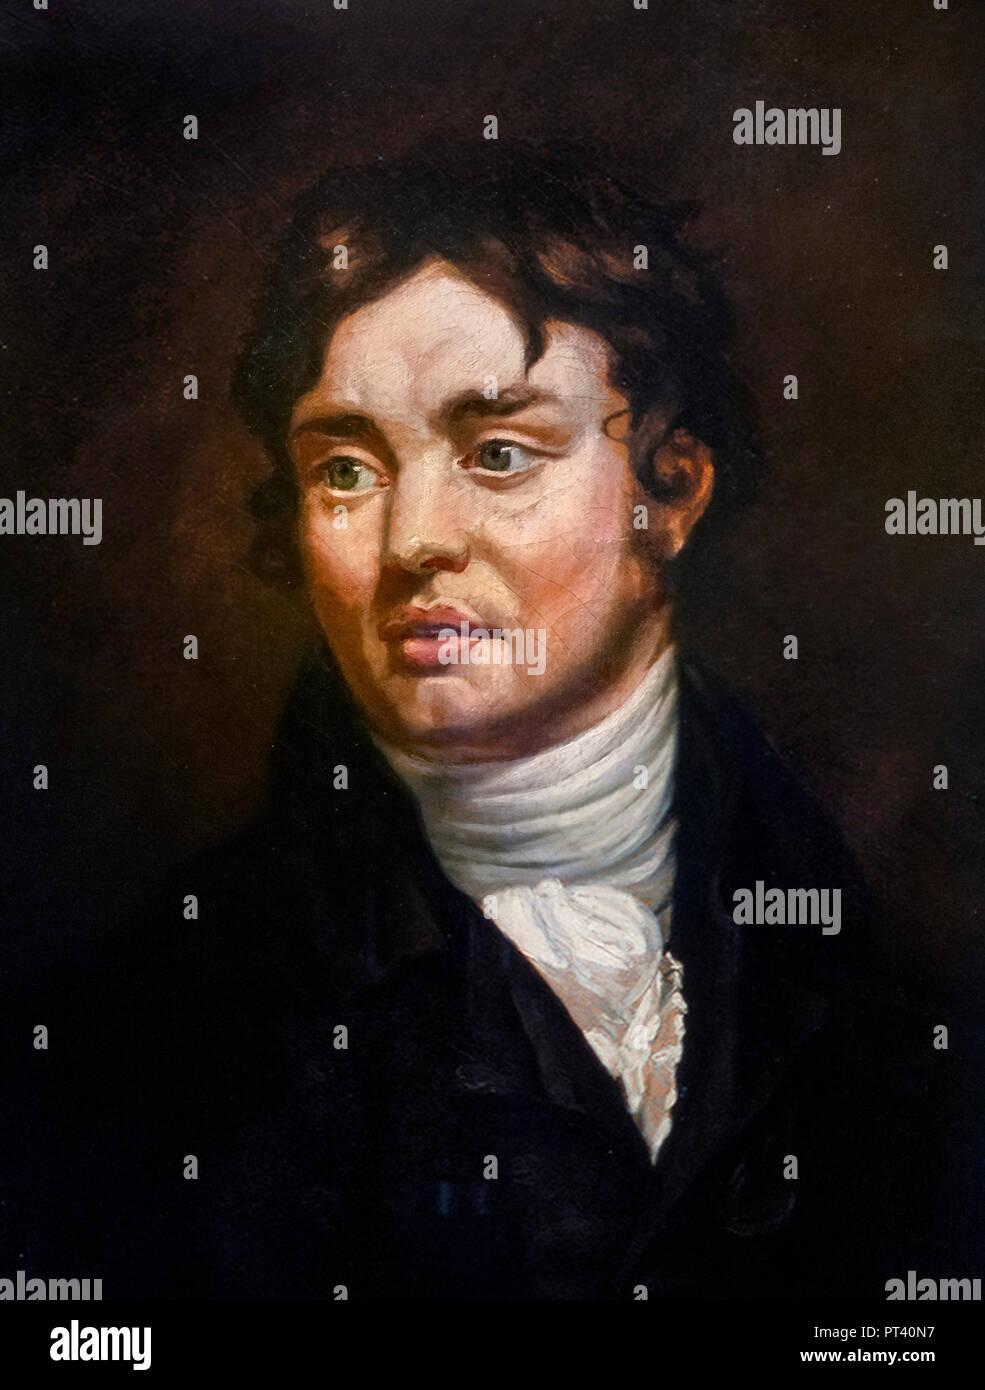 Samuel Taylor Coleridge (1772-1834) Porträt als junger Mann nach James  Northcote, Öl auf canves, 1804.